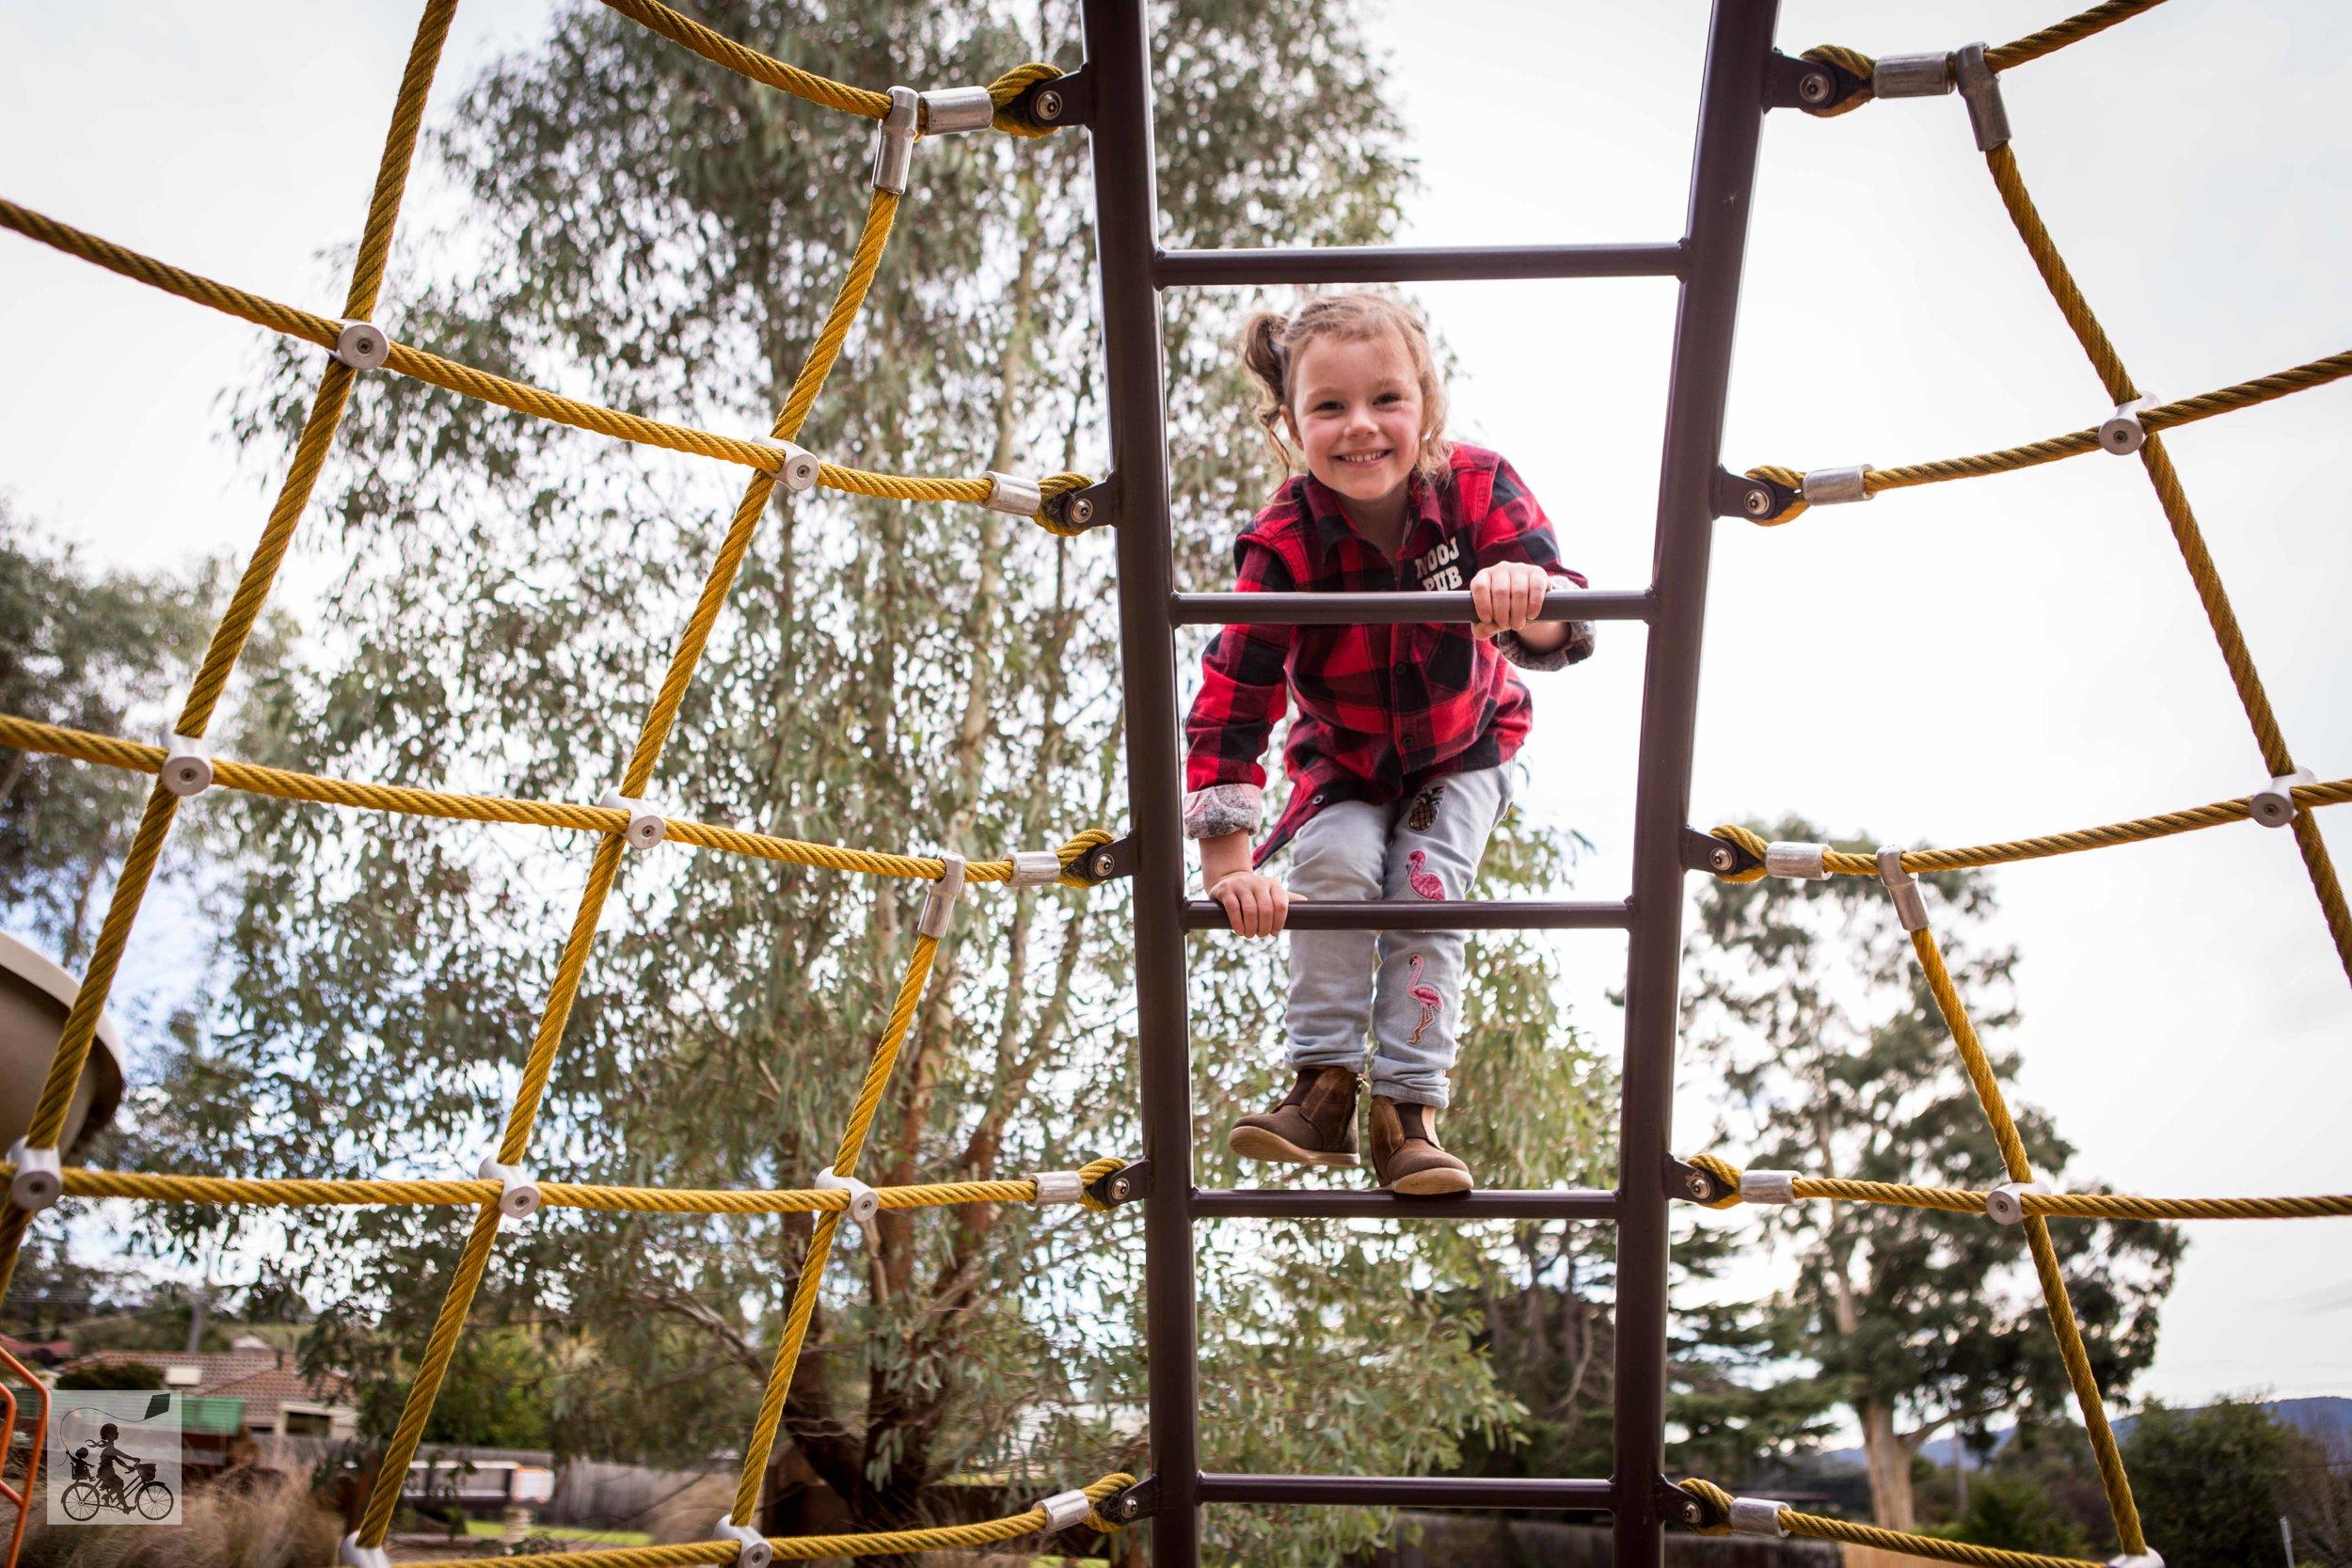 Woori Yallock Playground - Mamma Knows East (1 of 15).jpg